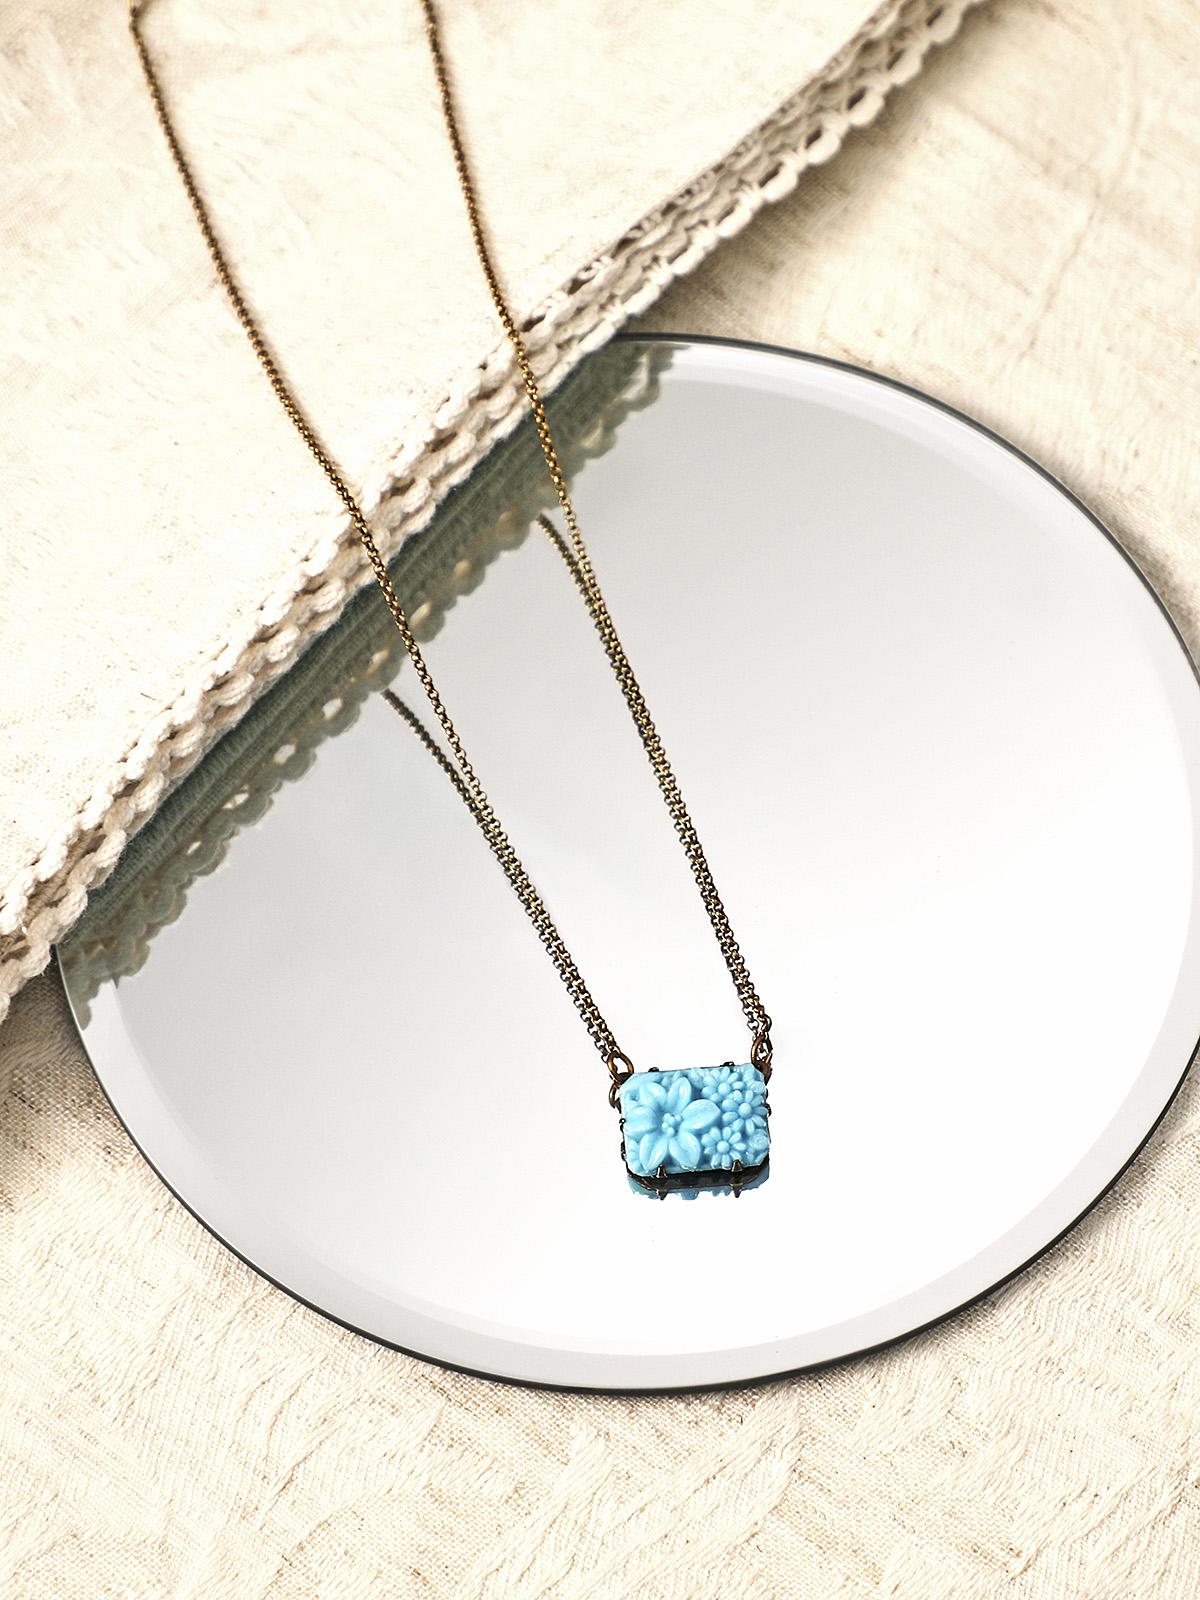 Forever Blossom Vault Necklace